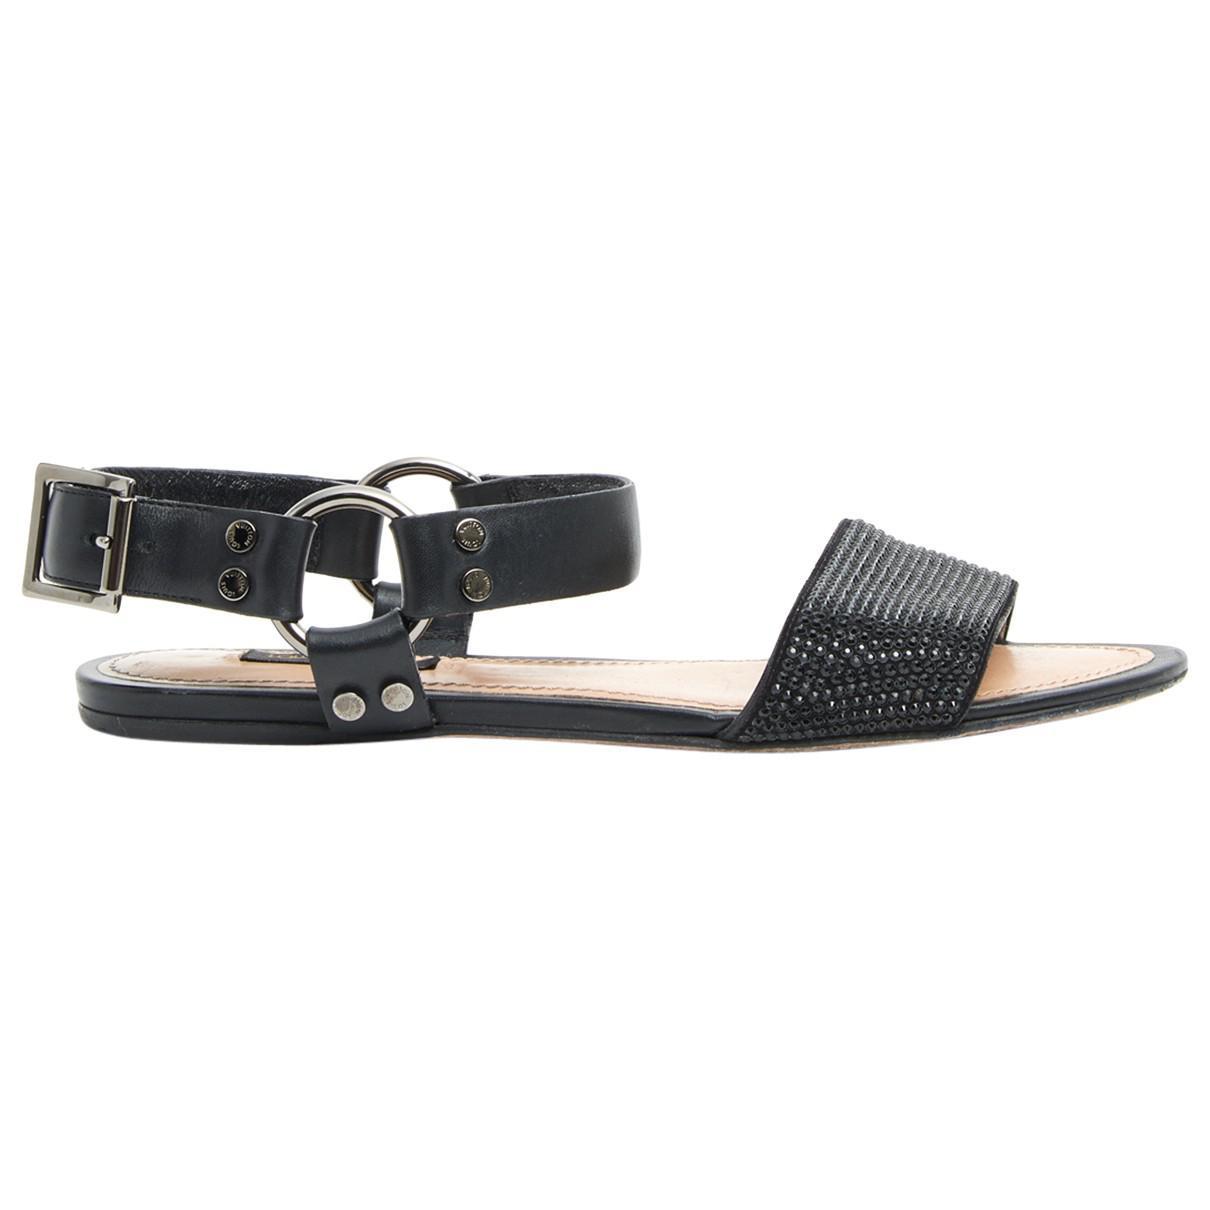 1415e5f55d2a Louis Vuitton. Women s Black Leather Sandals.  326 From Vestiaire Collective